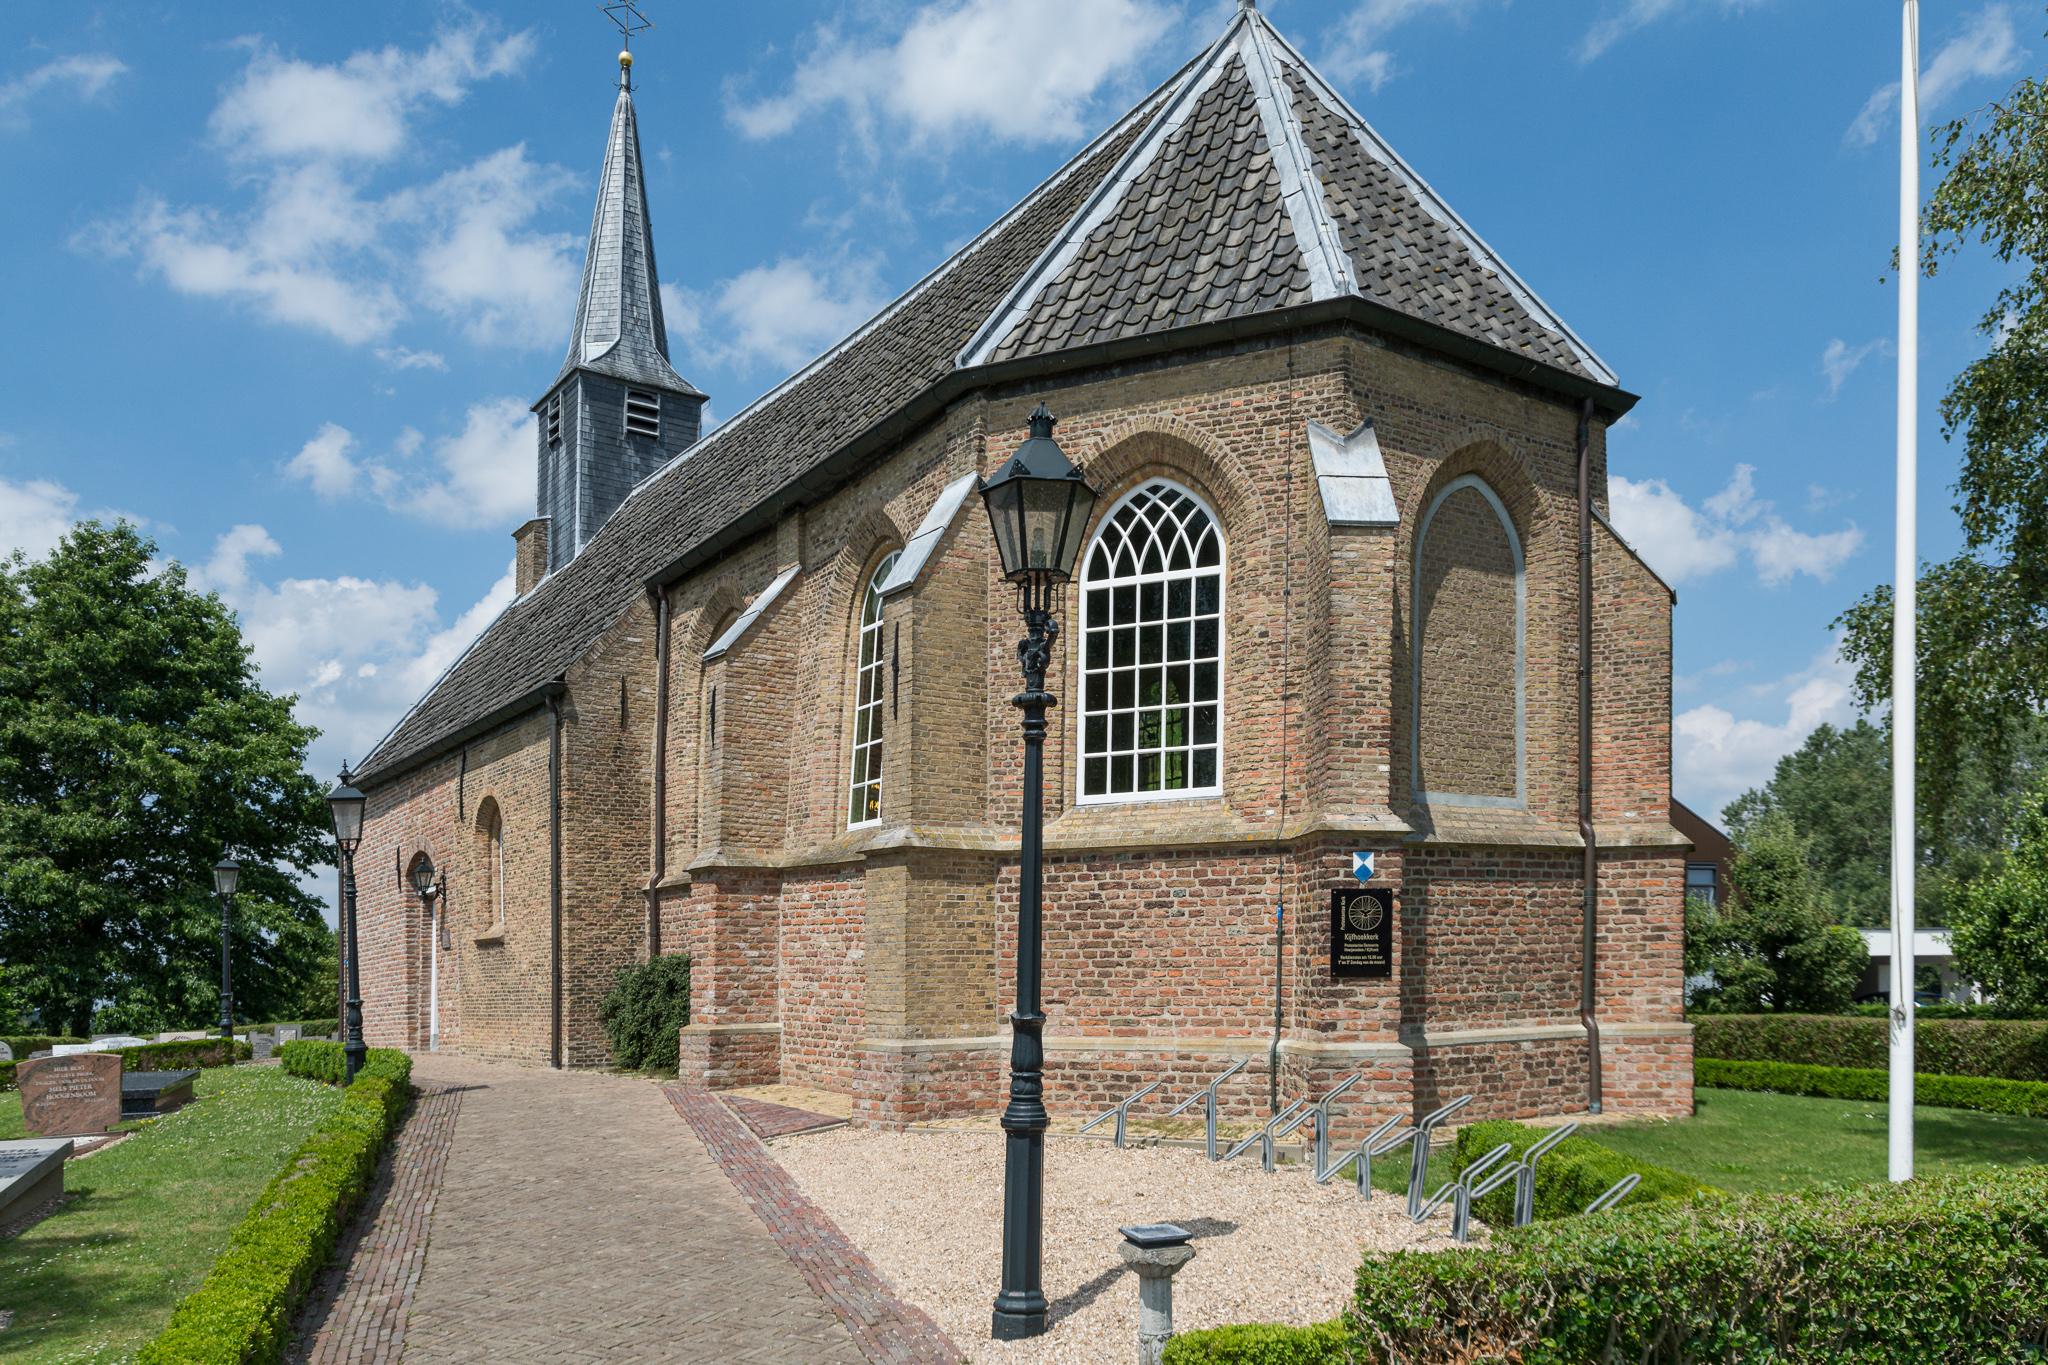 Kijfhoekkerk 22 juni 2019